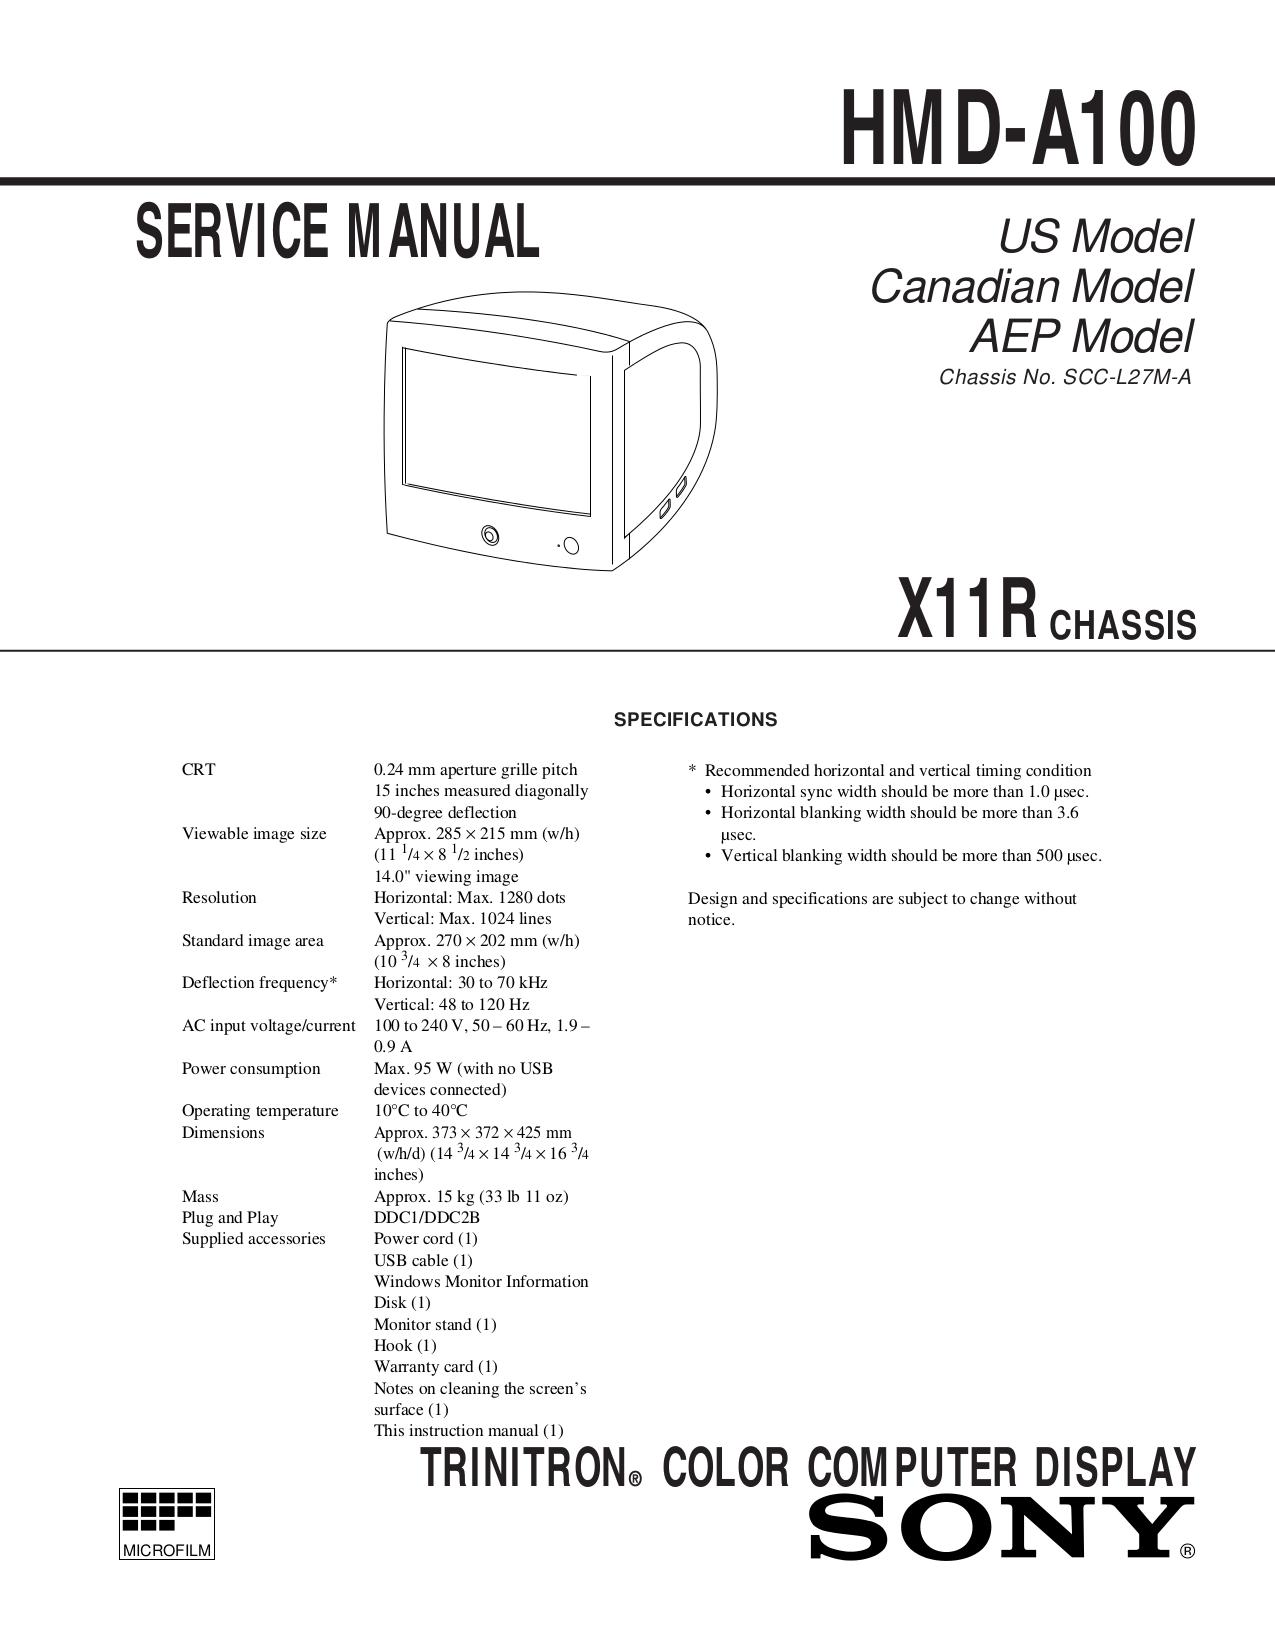 Sony A100 Manual Circuitlab Forums Analog Design Wien Bridge Oscillator Pdf Download Array For Monitor Hmd Rh Umlib Com